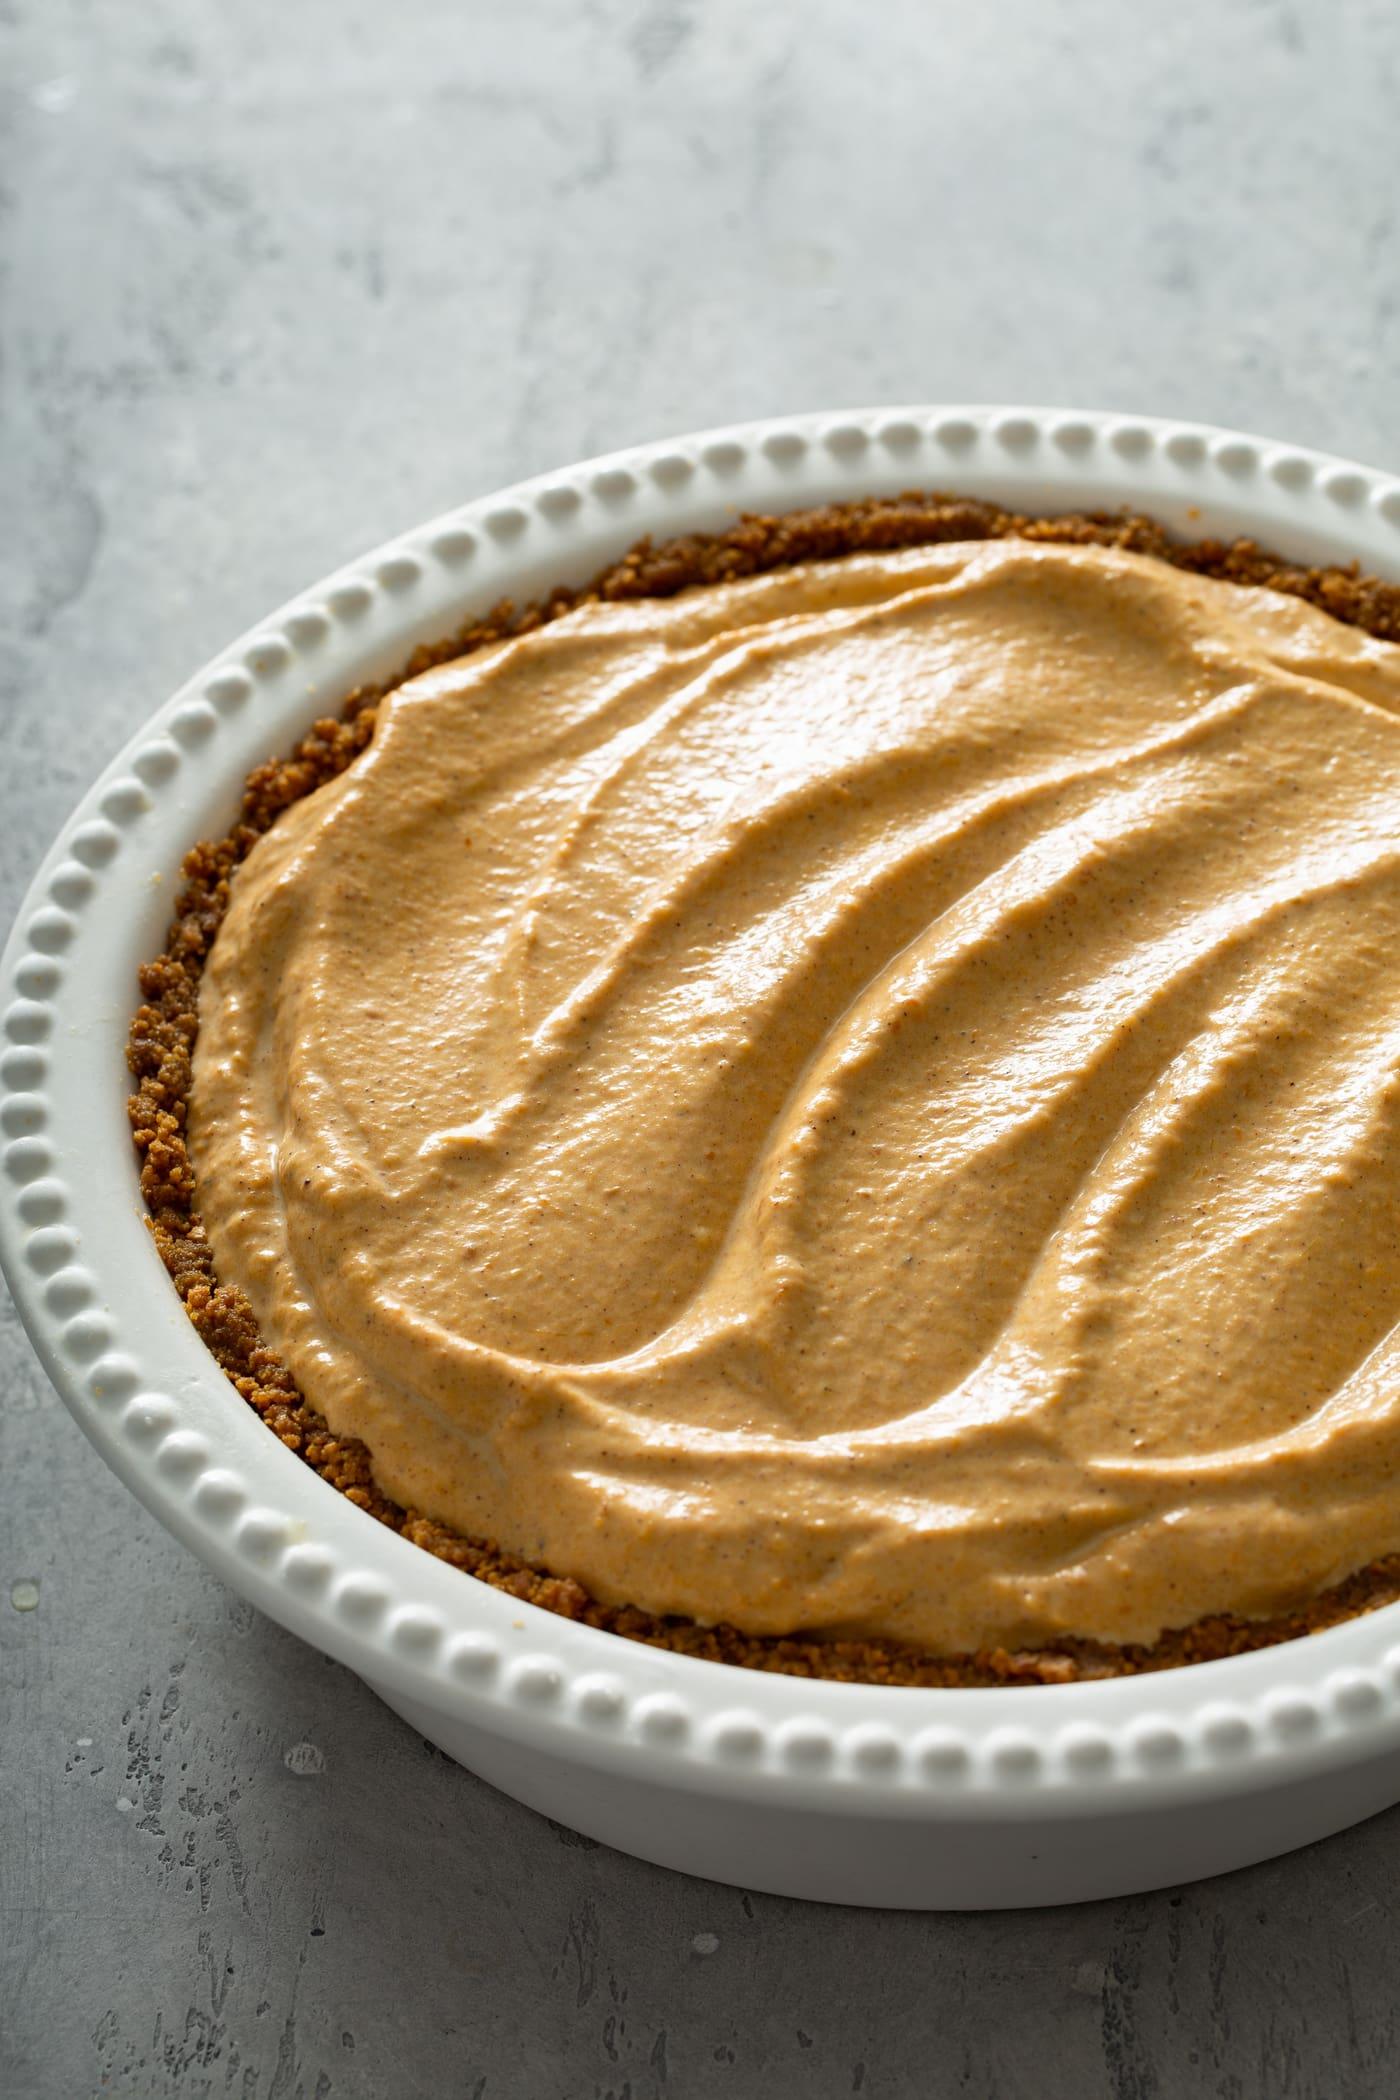 A whole pumpkin ice cream pie in a white pie dish.